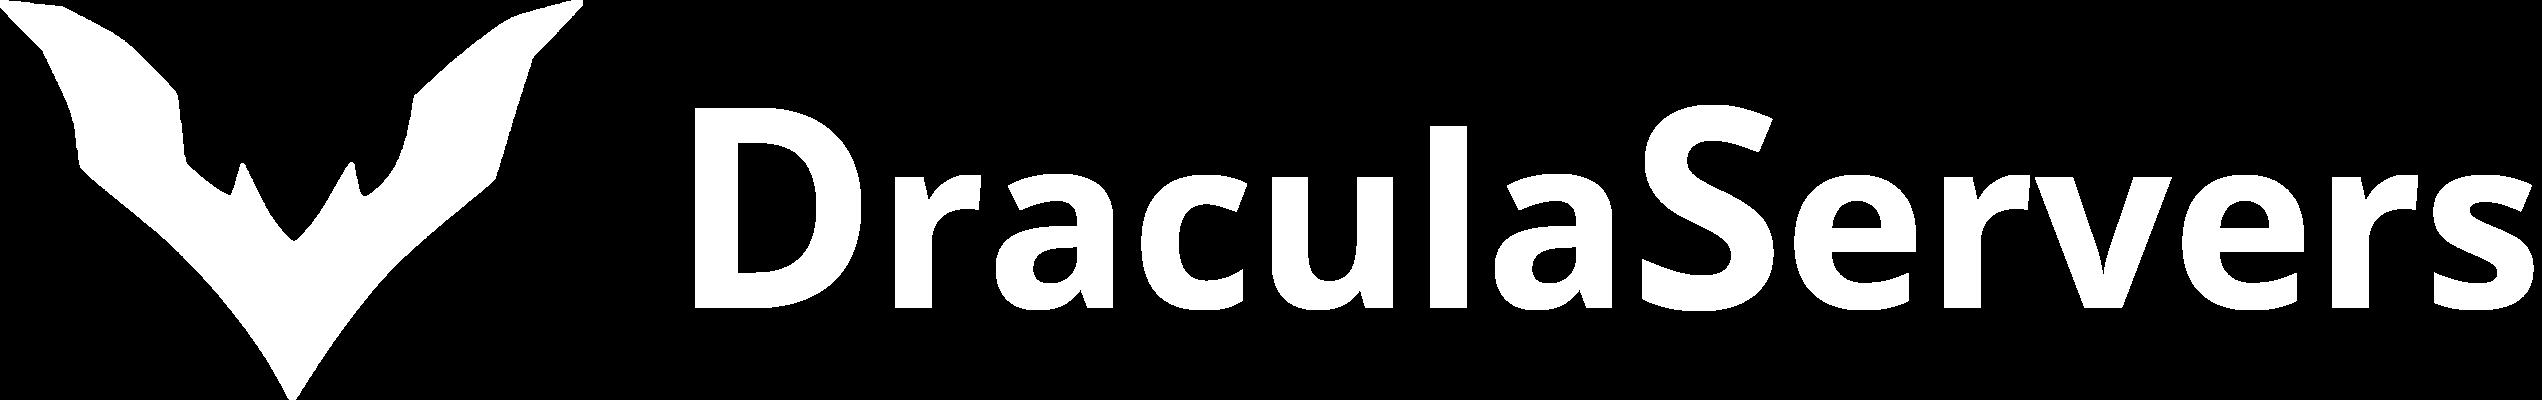 Dracula Servers